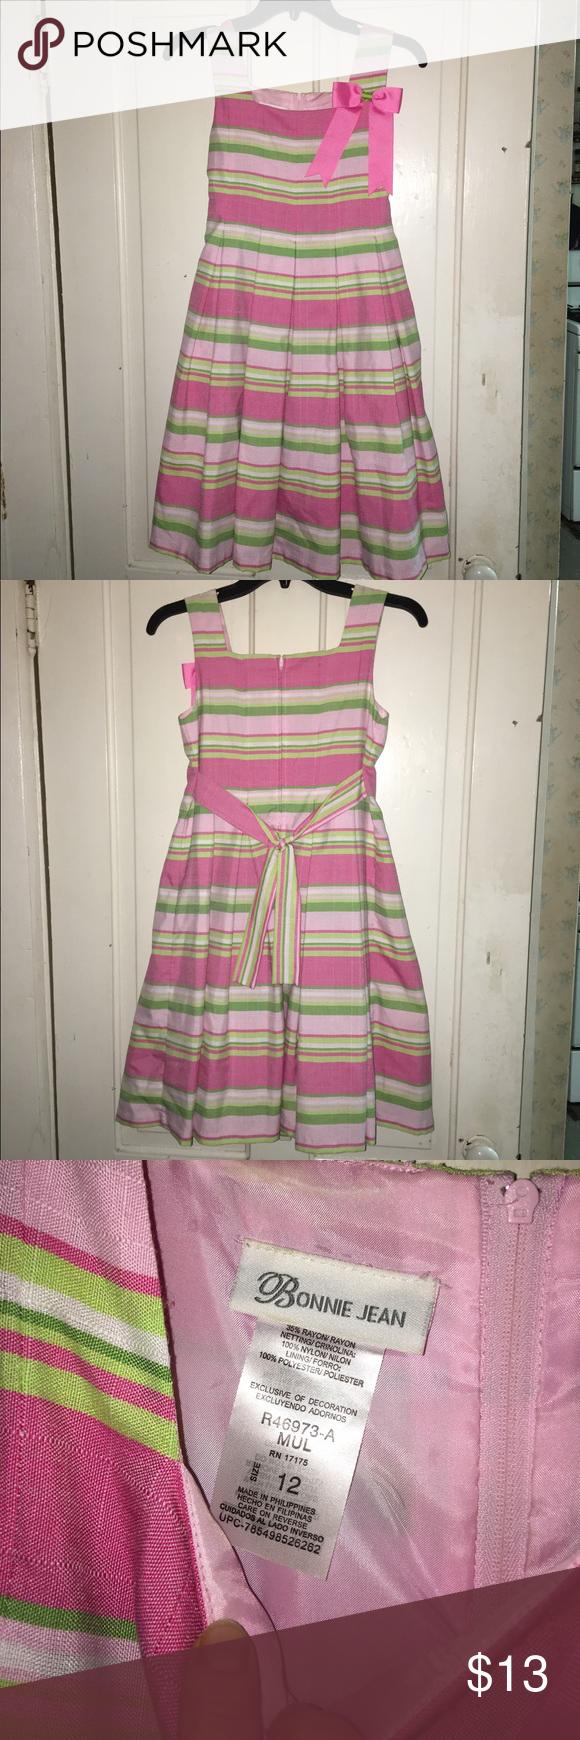 Girls Sleeveless Summer Dress Size 12 Sleeveless Dress Summer Summer Dresses Dresses [ 1740 x 580 Pixel ]